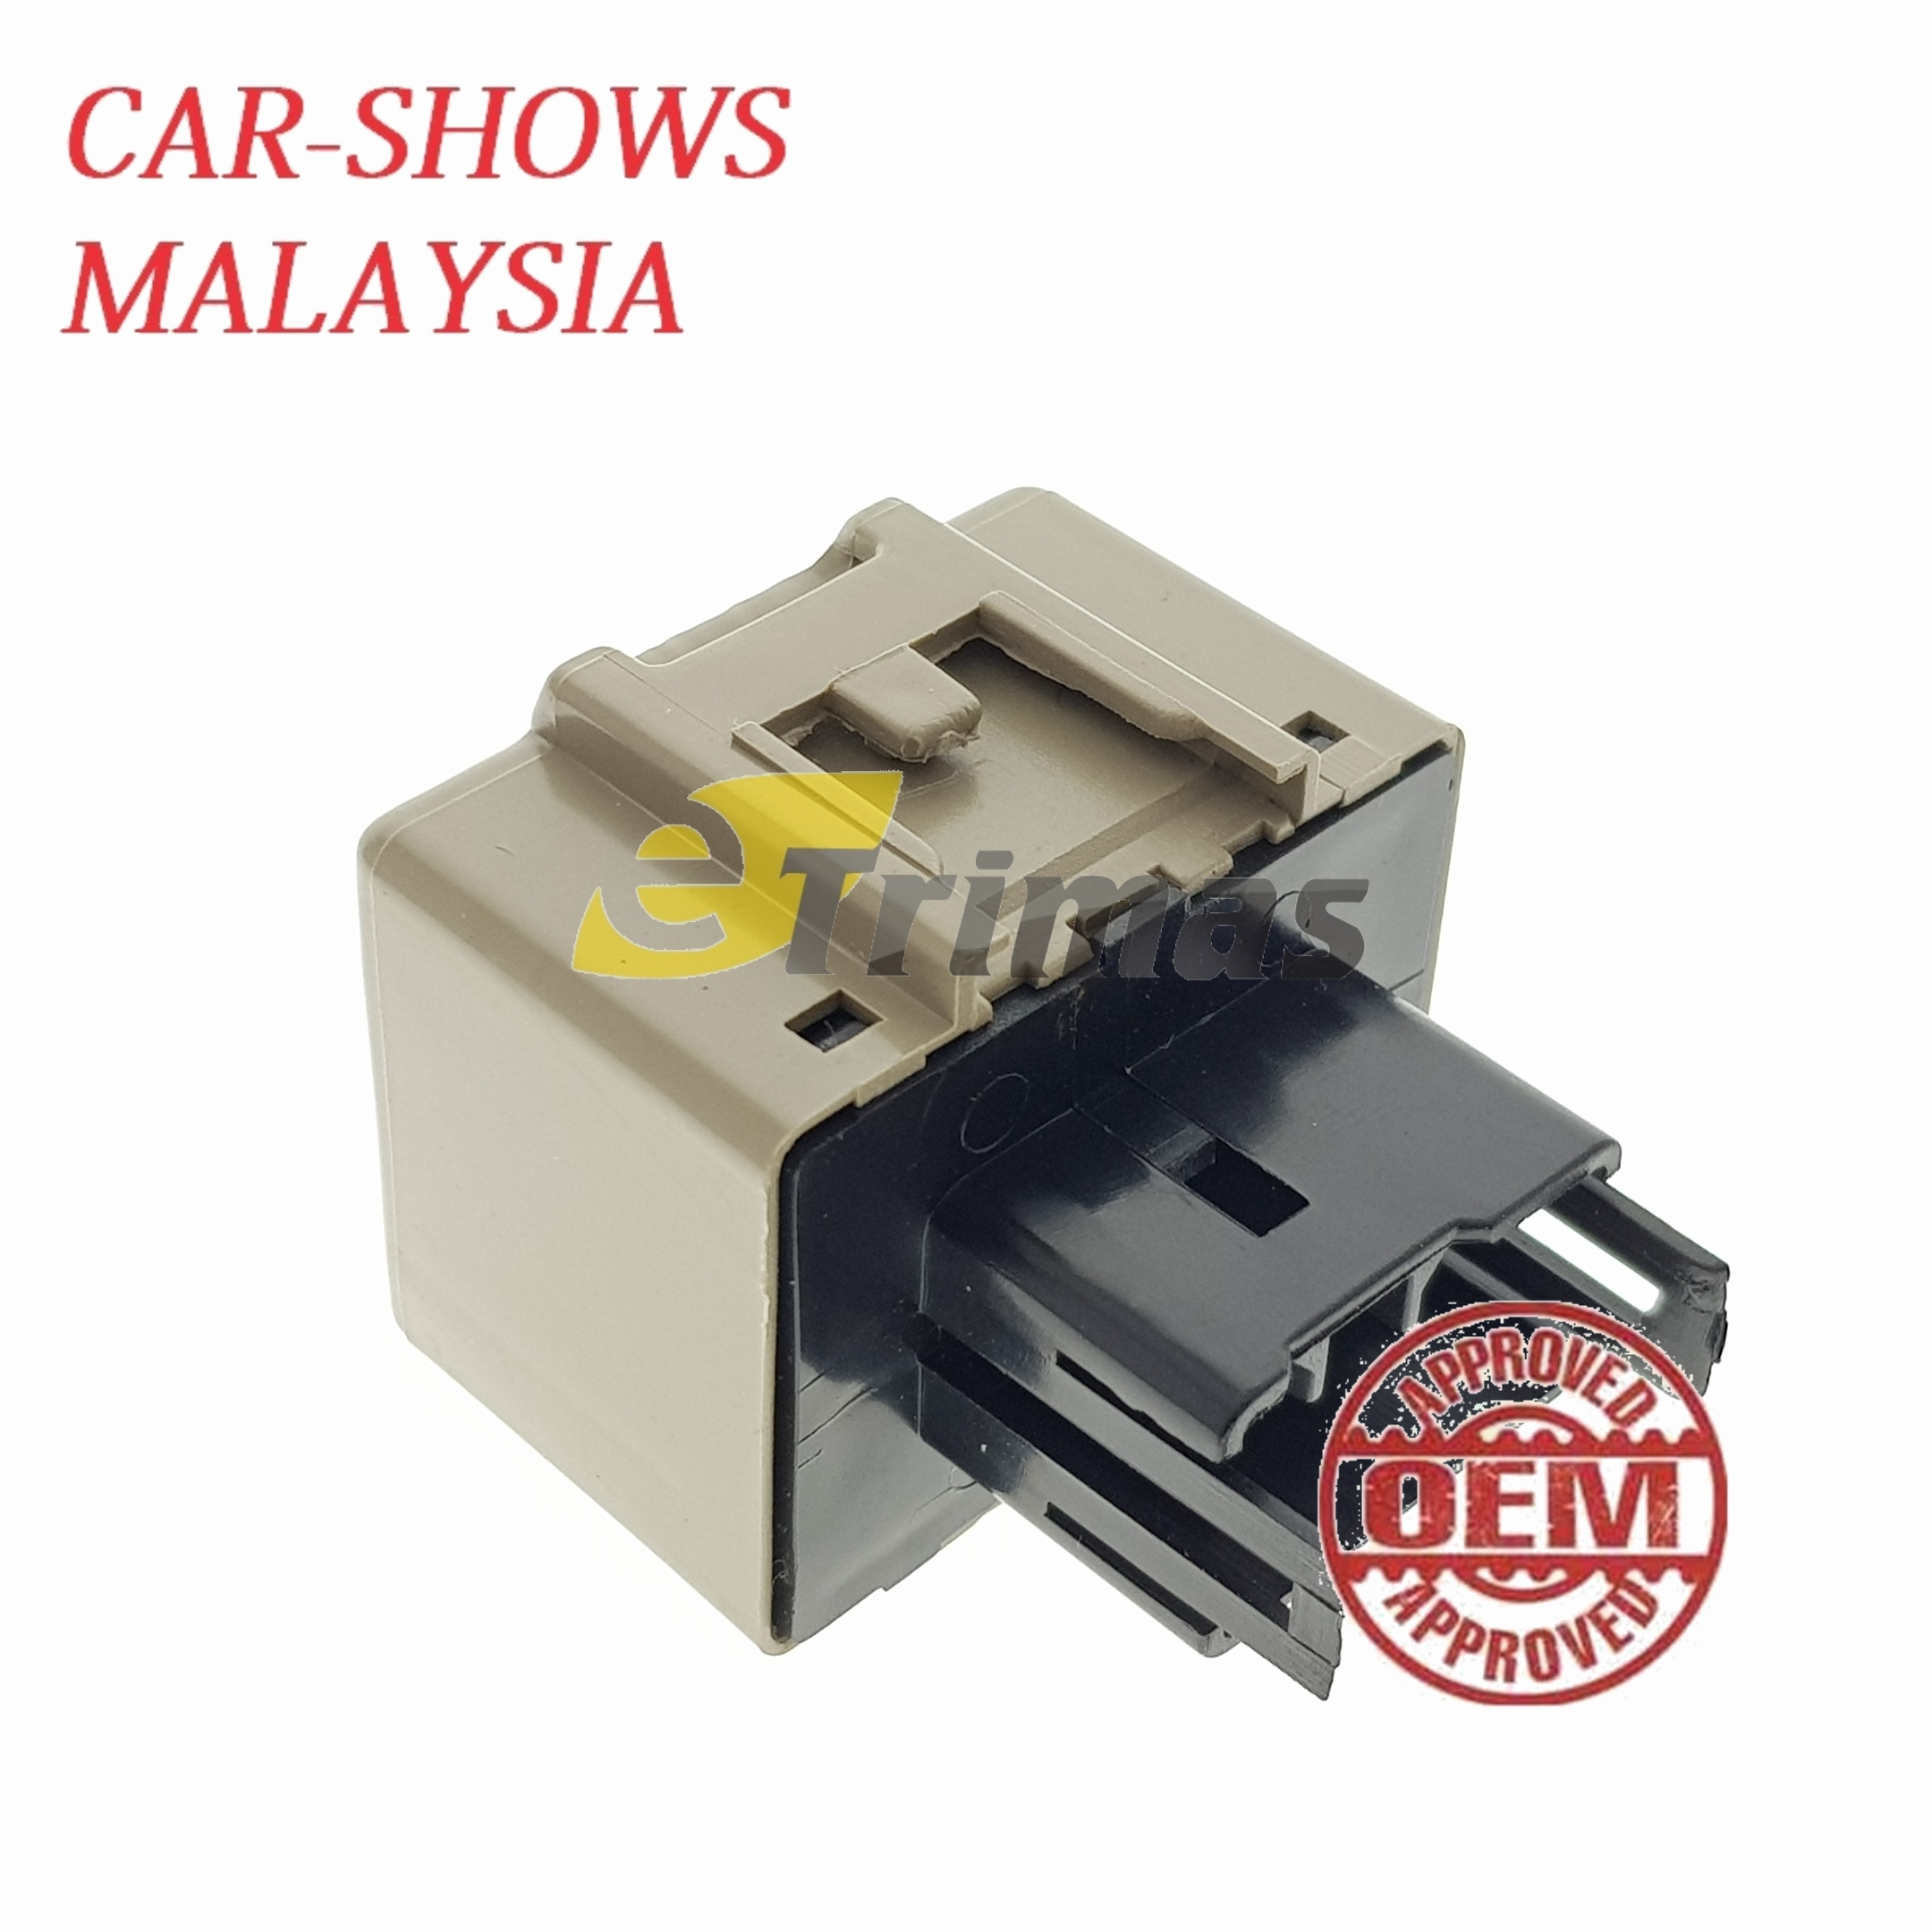 Perodua Myvi Alza LED Flasher Relay Unit Fix Hyper Flash Turn Signal Light